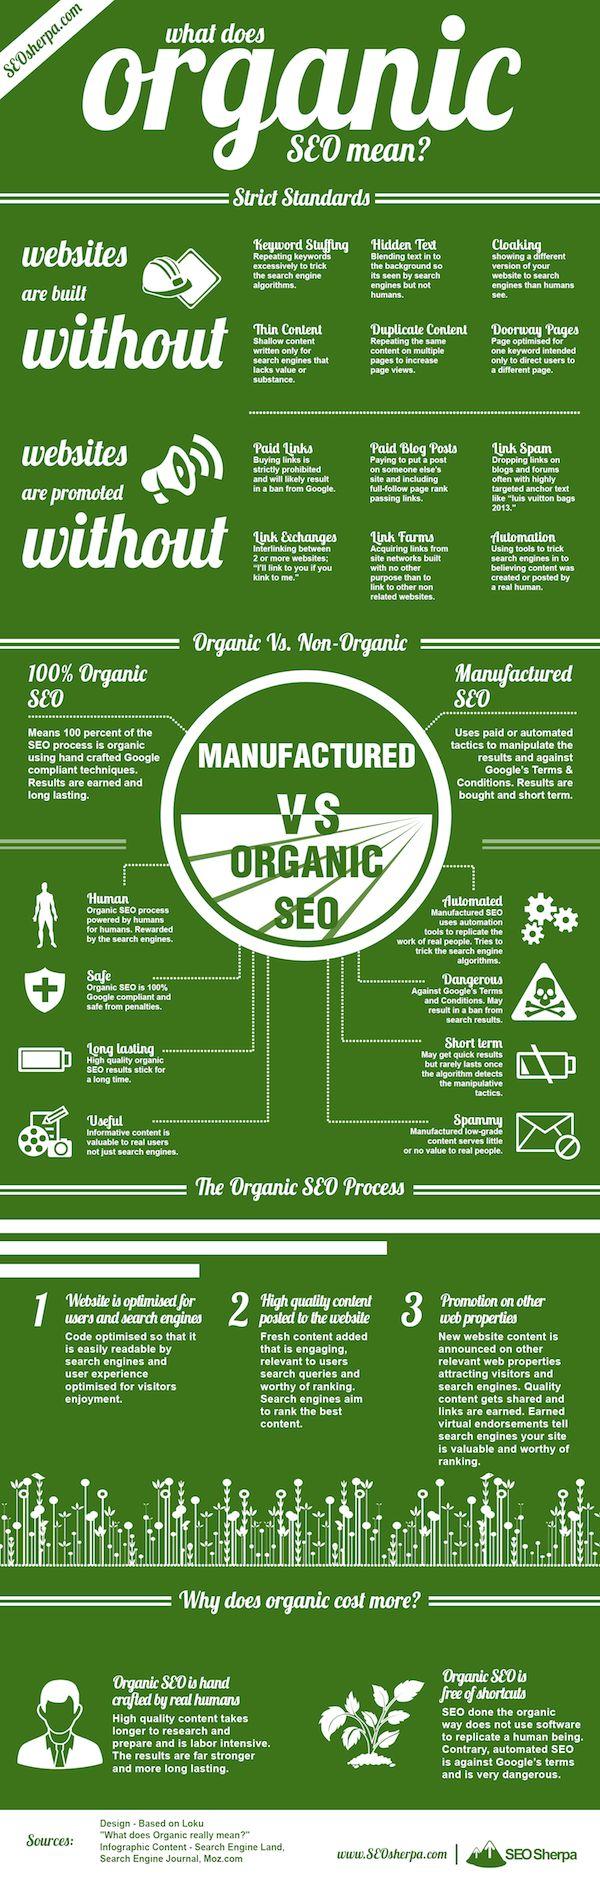 What doesa organic seo mean? #infografia #infographic #seo